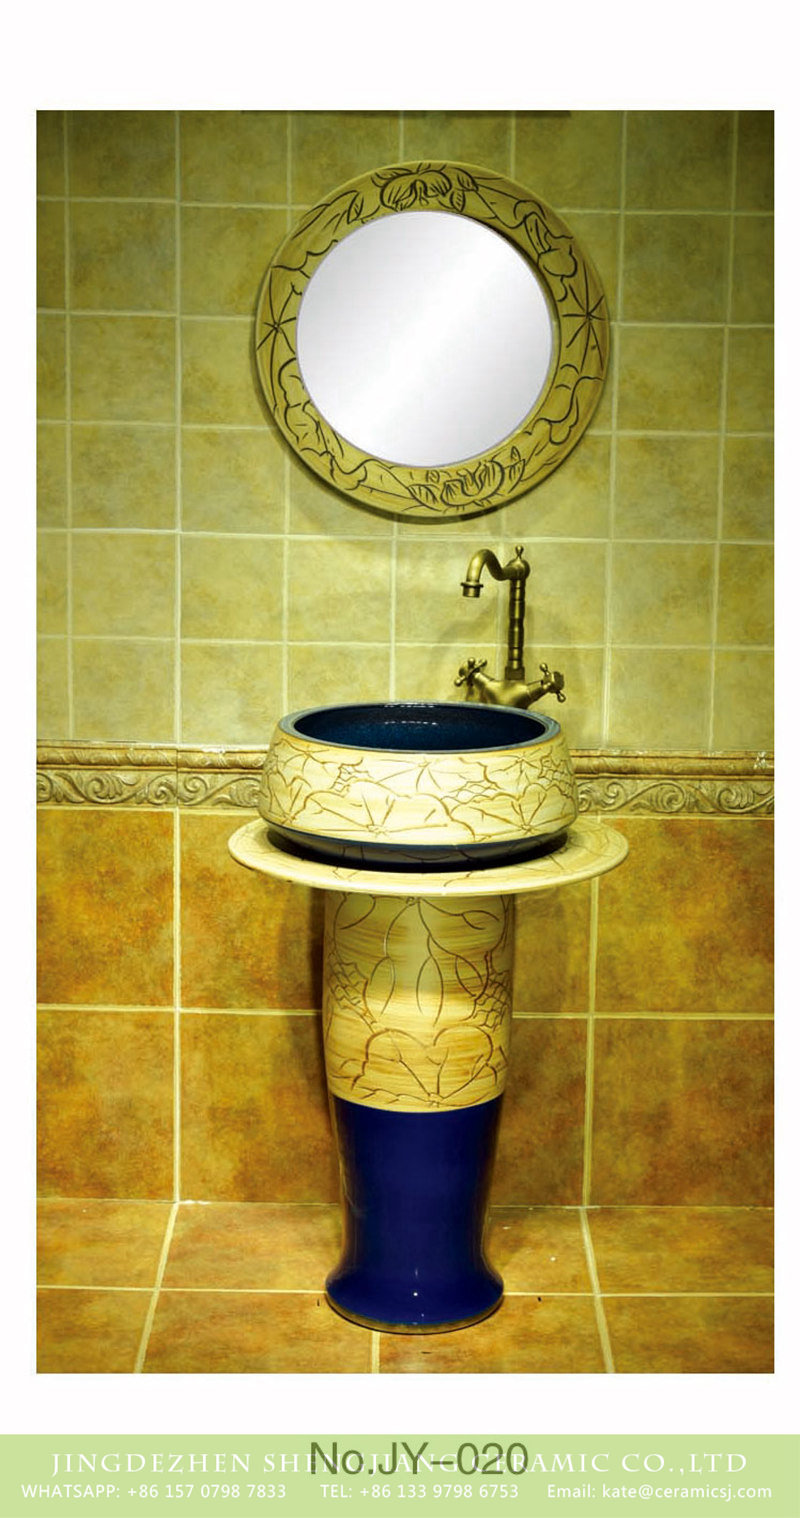 SJJY-020-68立柱盆_07 Hot sale hand caved beautiful pattern new product pedestal basin - shengjiang  ceramic  factory   porcelain art hand basin wash sink